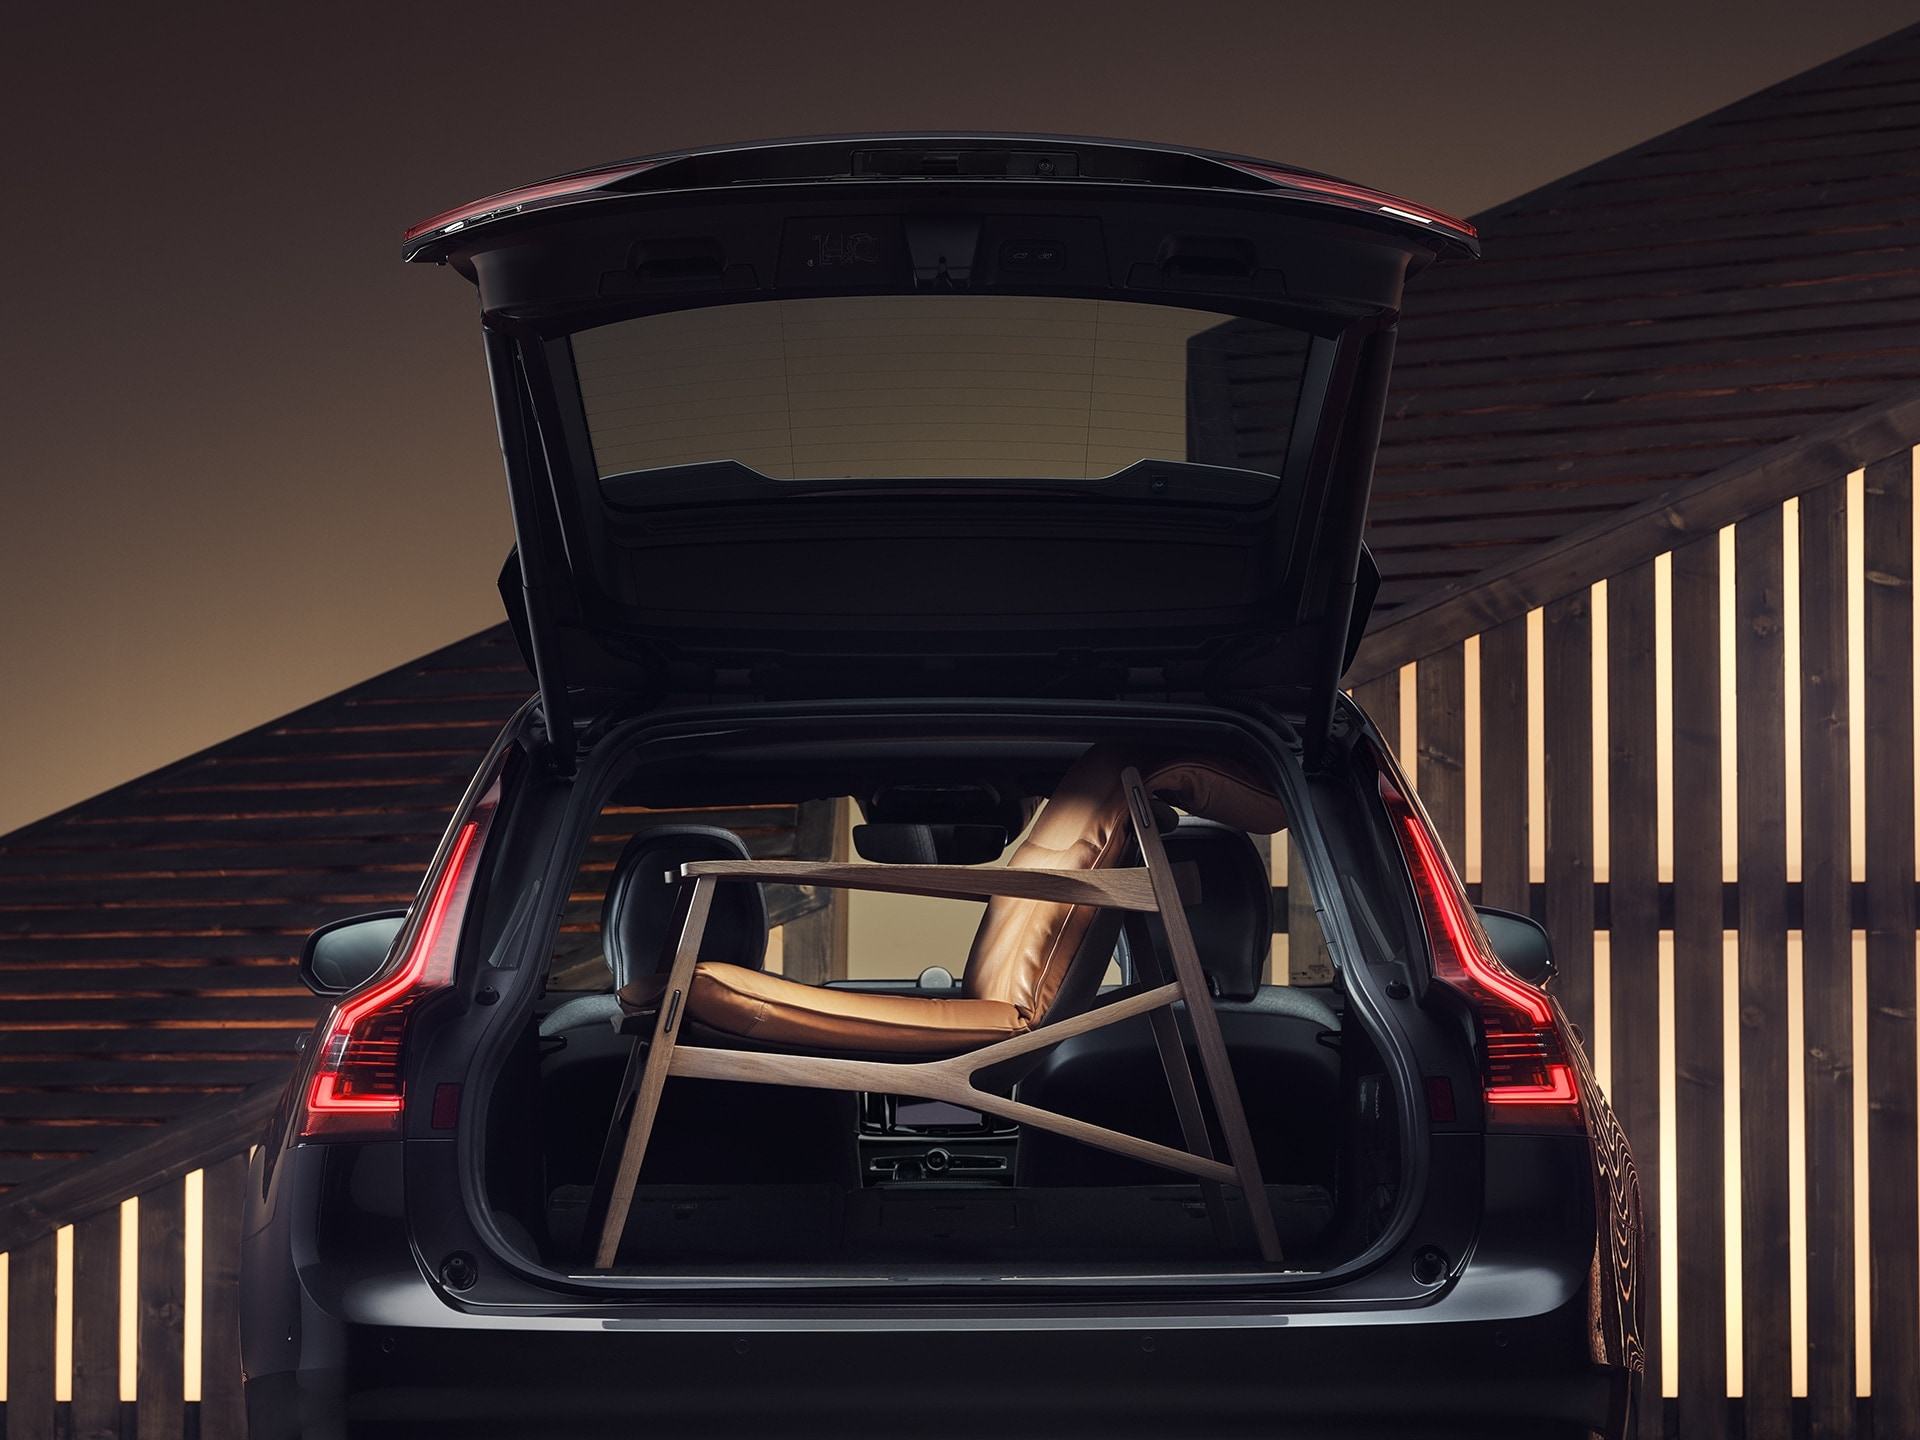 Bagageutrymmet i en Volvo V90i med en brun elegant fåtölj